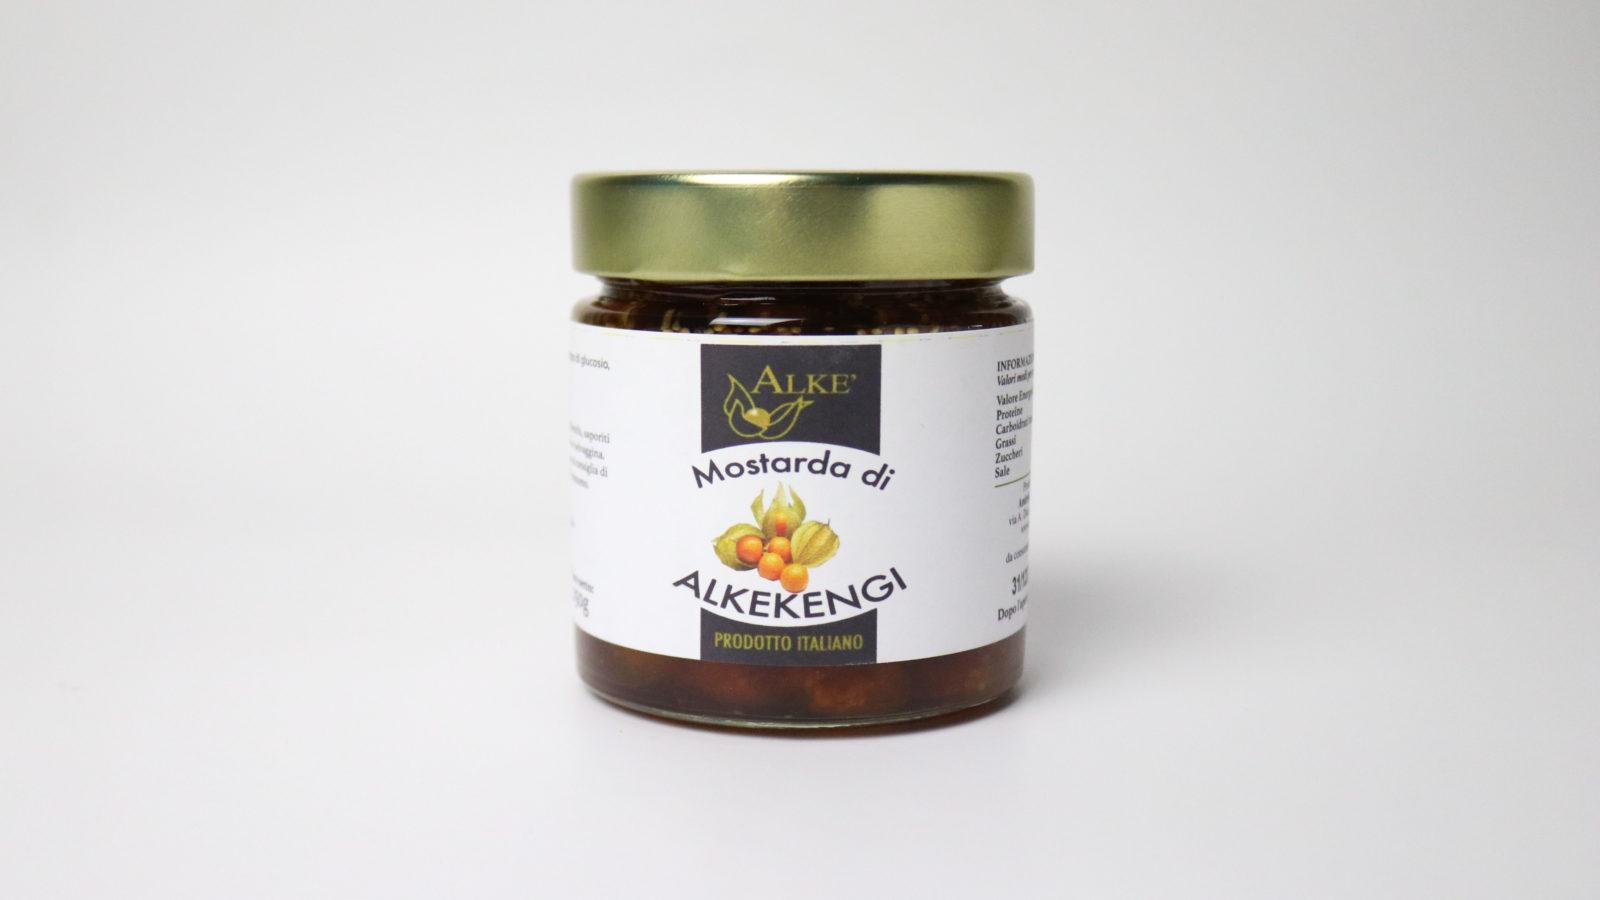 mostarda di Alkekengi